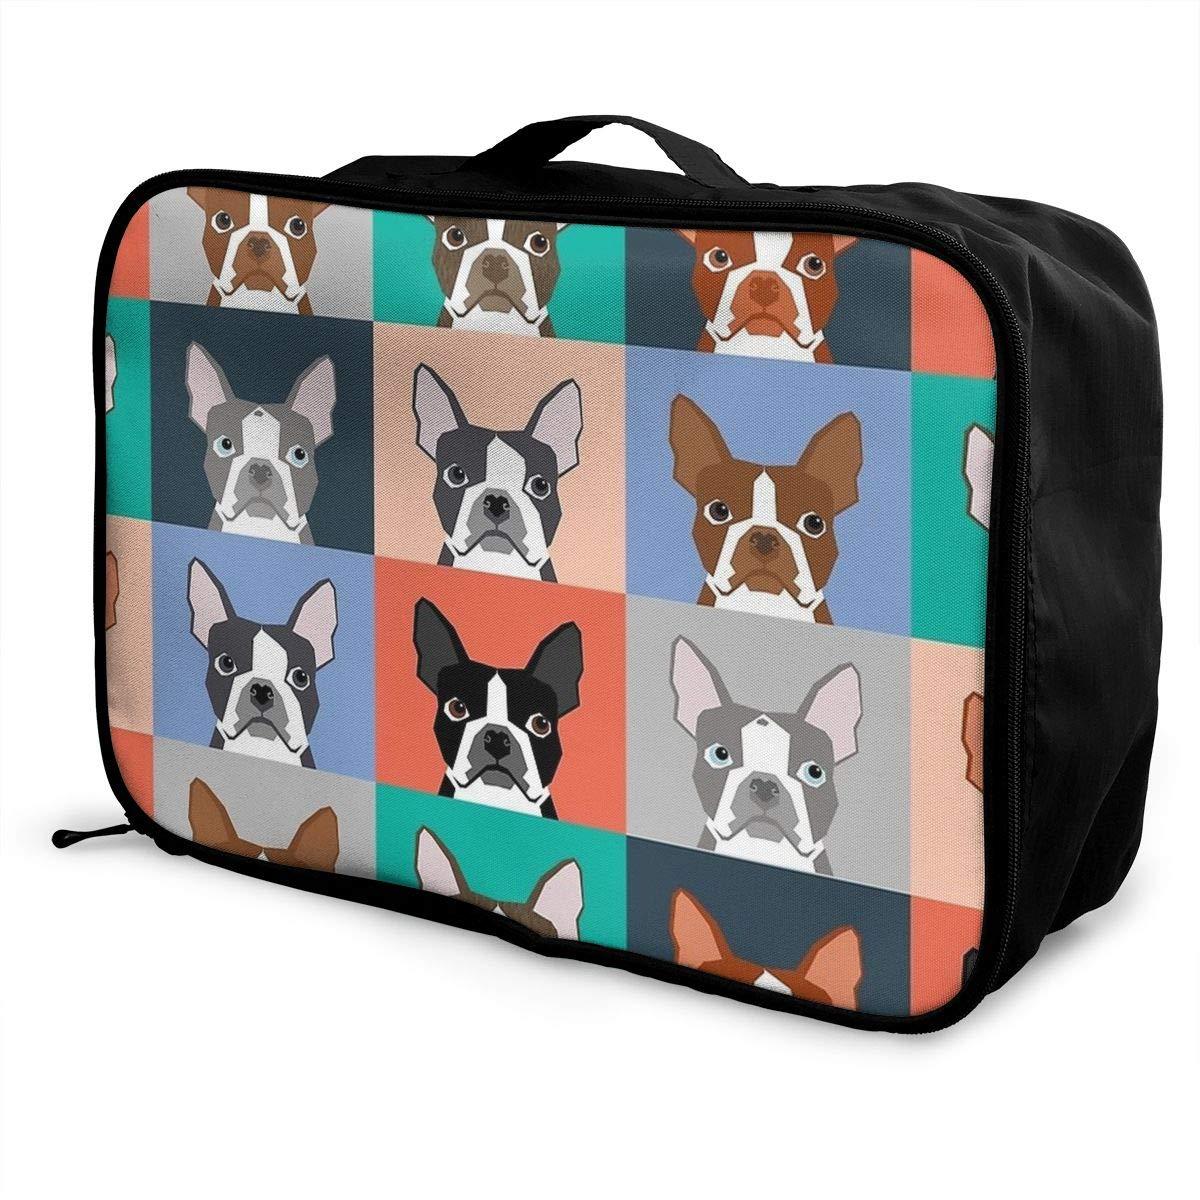 Boston Terriers Tile Bulldog Dog Set Pattern Travel Duffel Bag Casual Large Capacity Portable Luggage Bag Suitcase Storage Bag Luggage Packing Tote Bag Weekend Trip